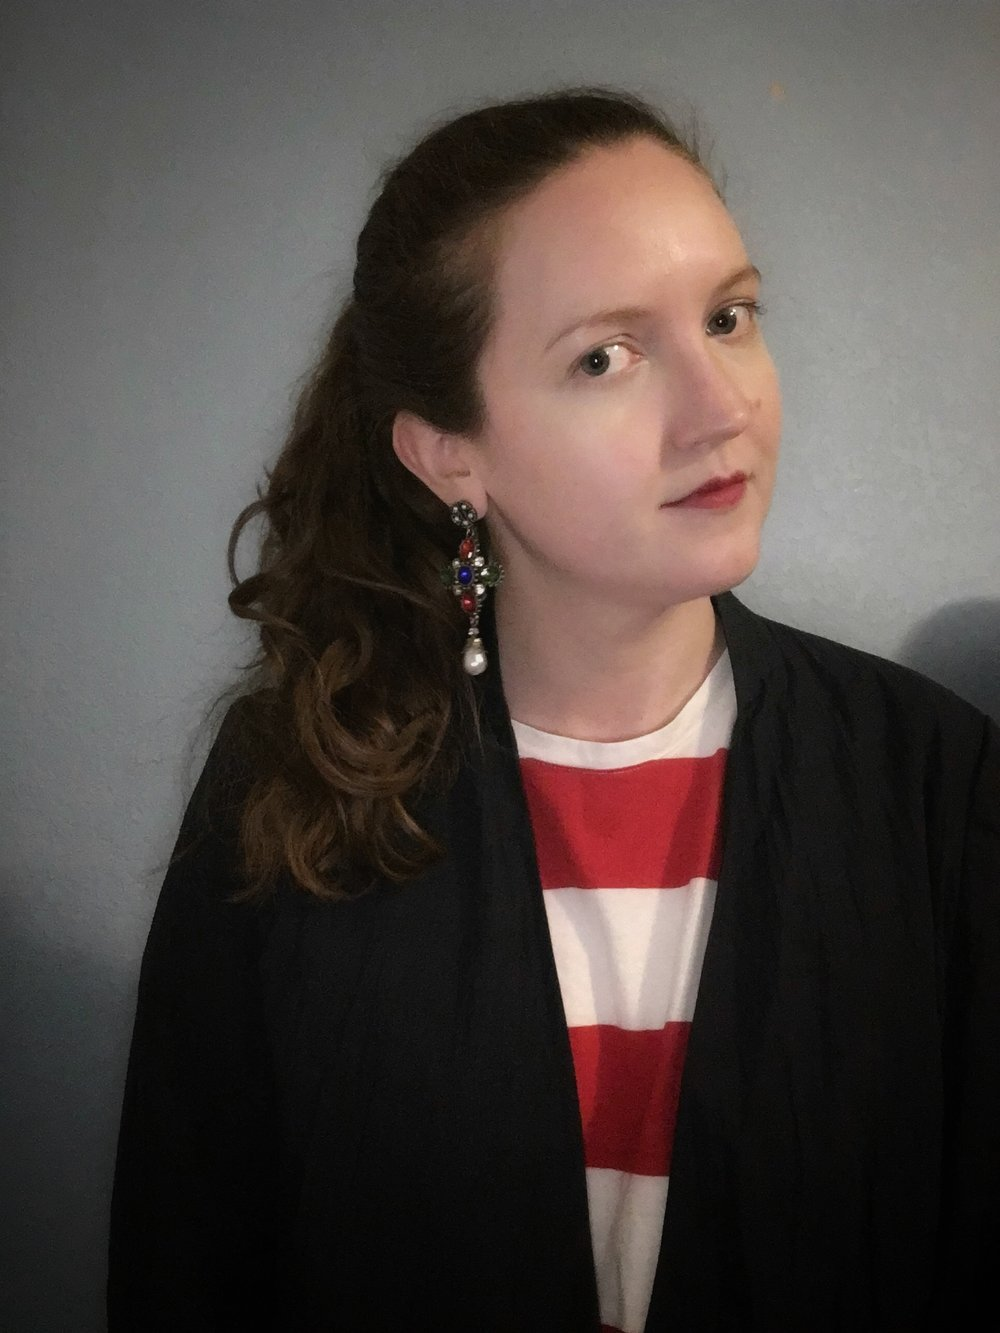 Stripes for spring navy blazer Everlane red striped tee shirt dress Shashi earrings from Shopbop.jpg